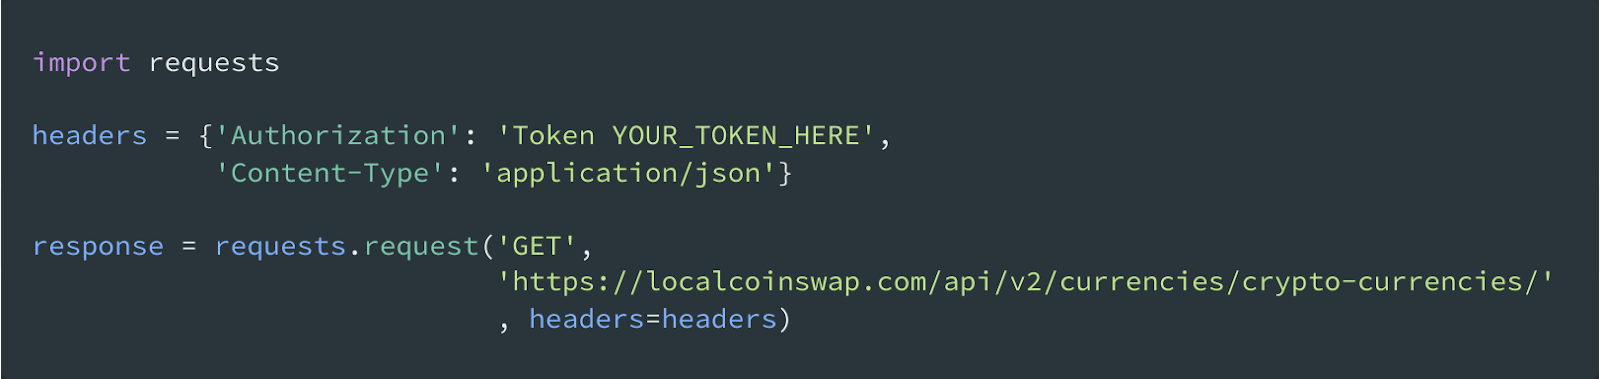 cryptocurrency trading API python